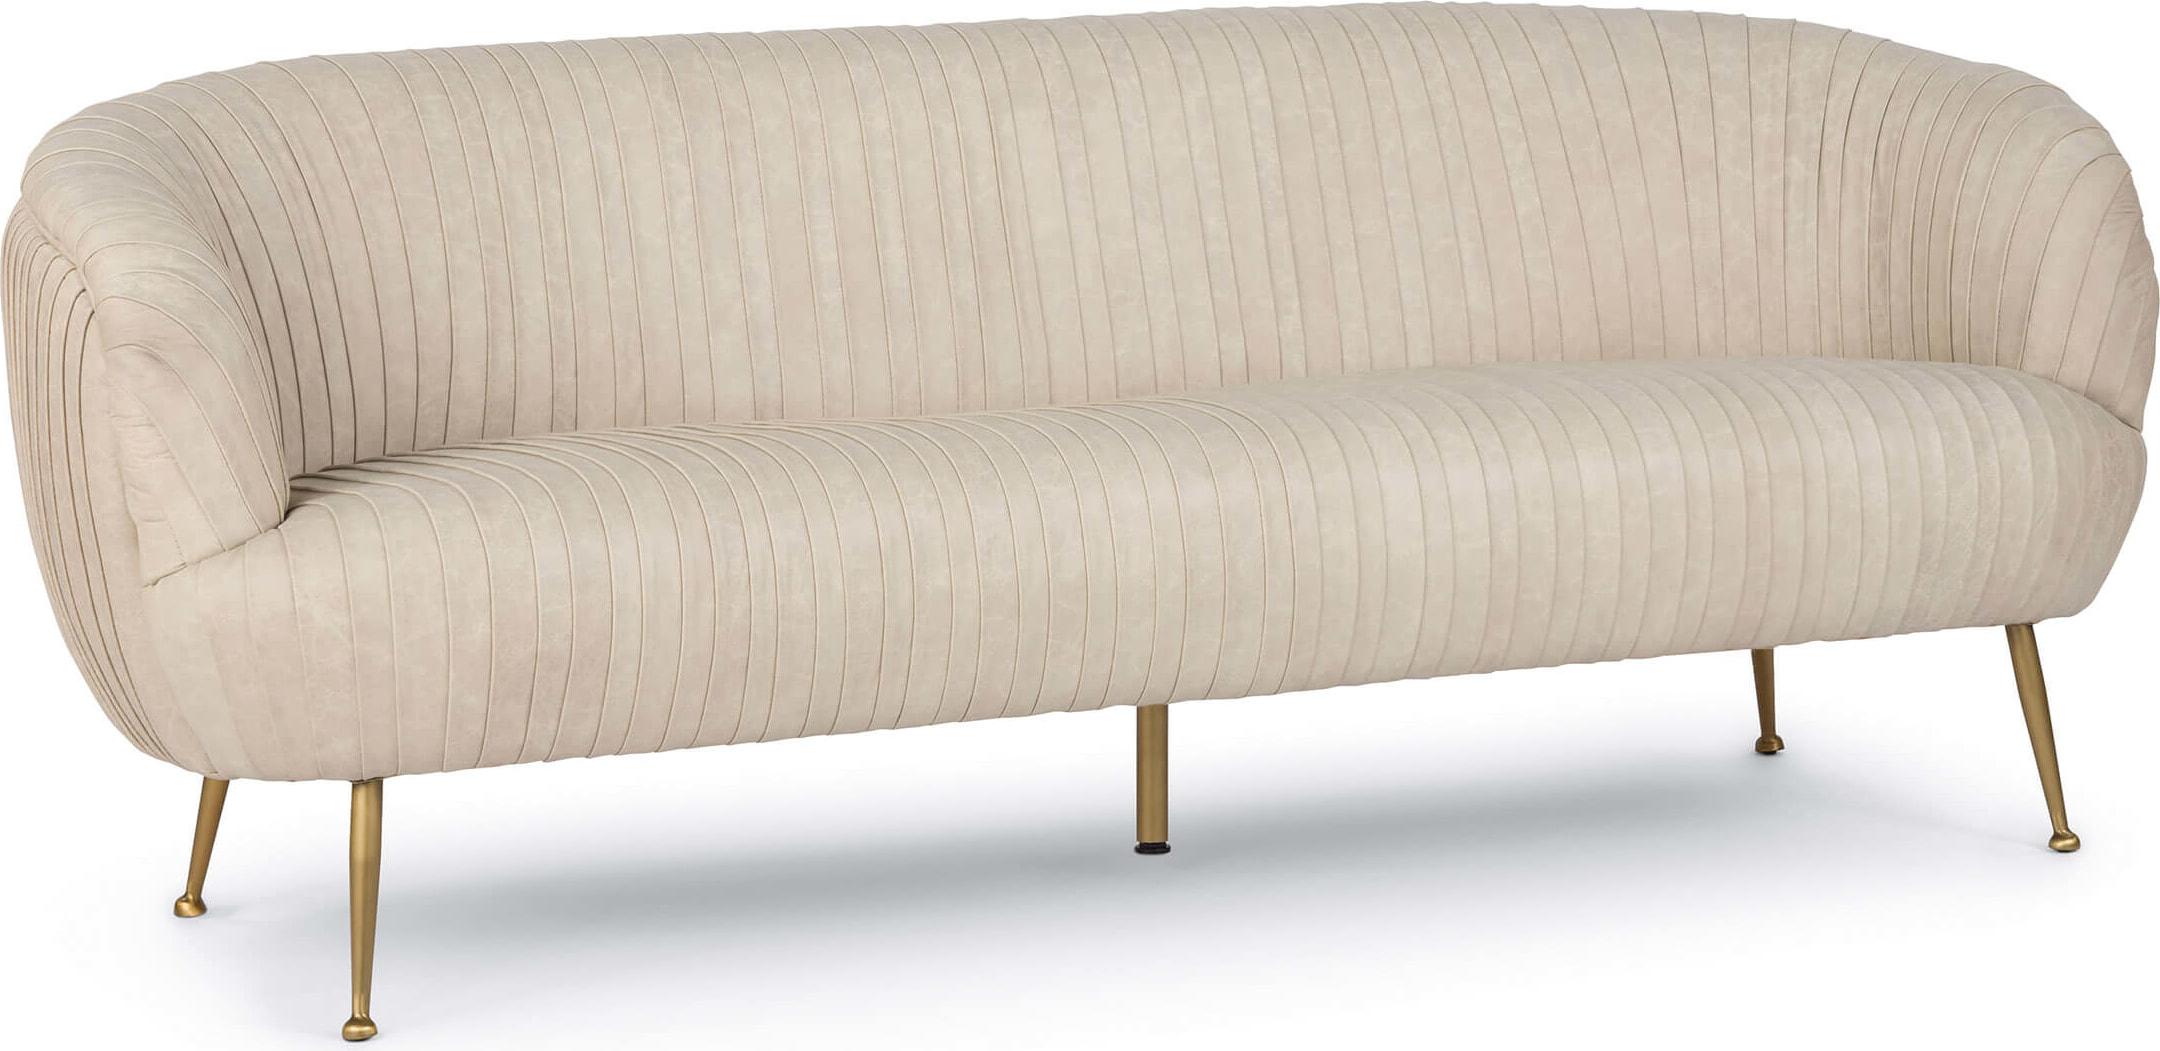 Regina Andrew Design Beretta Sofa | Layla Grayce on Beretta Outdoor Living id=18089